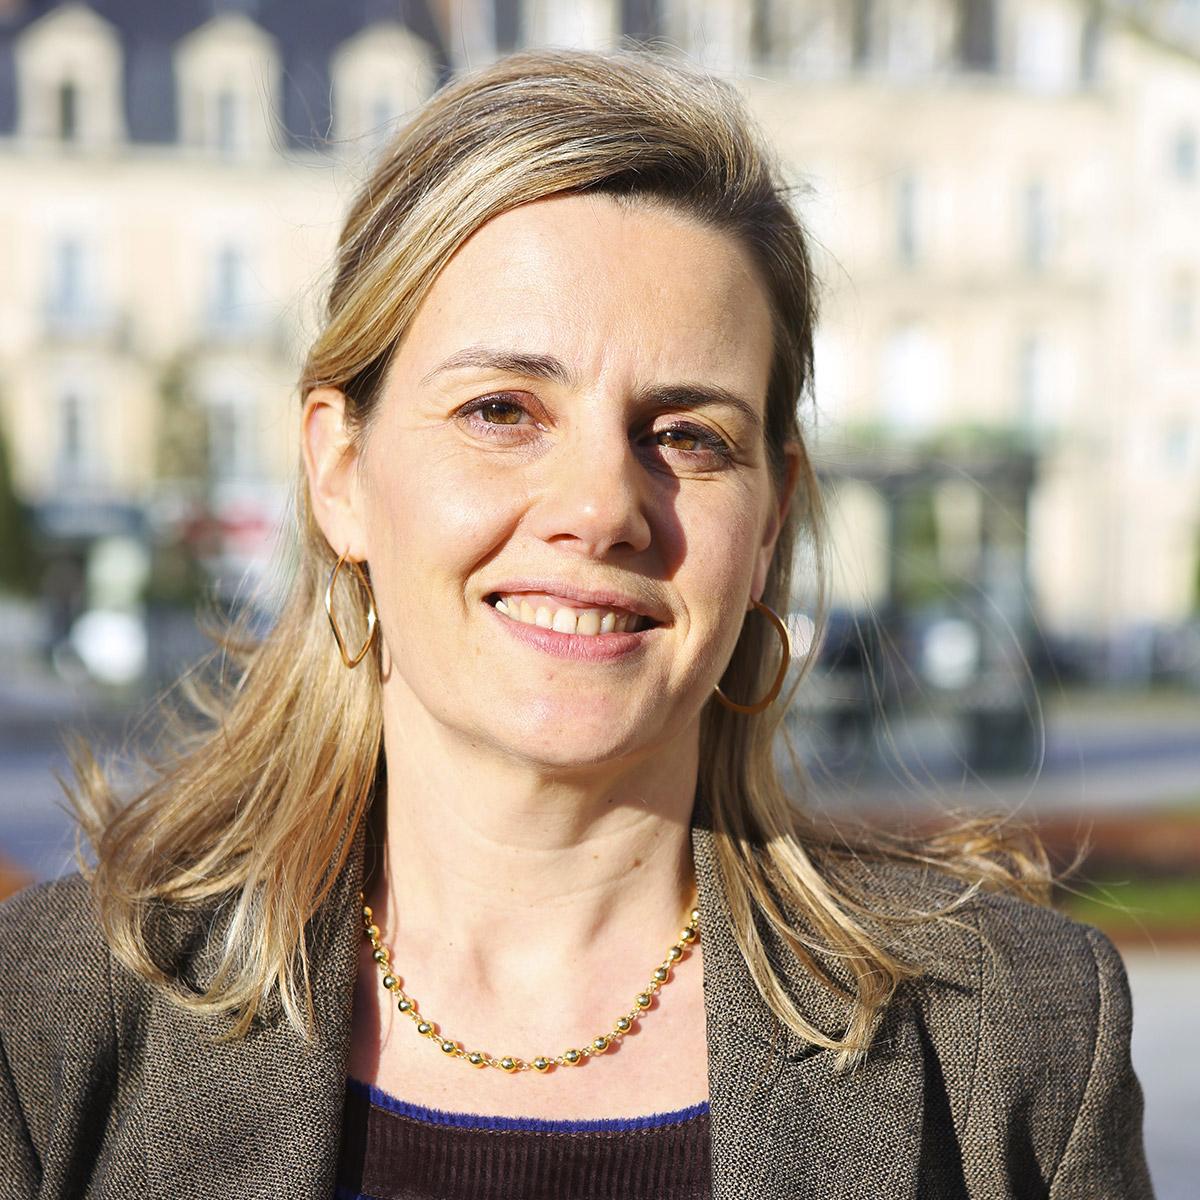 Geneviève Letourneux